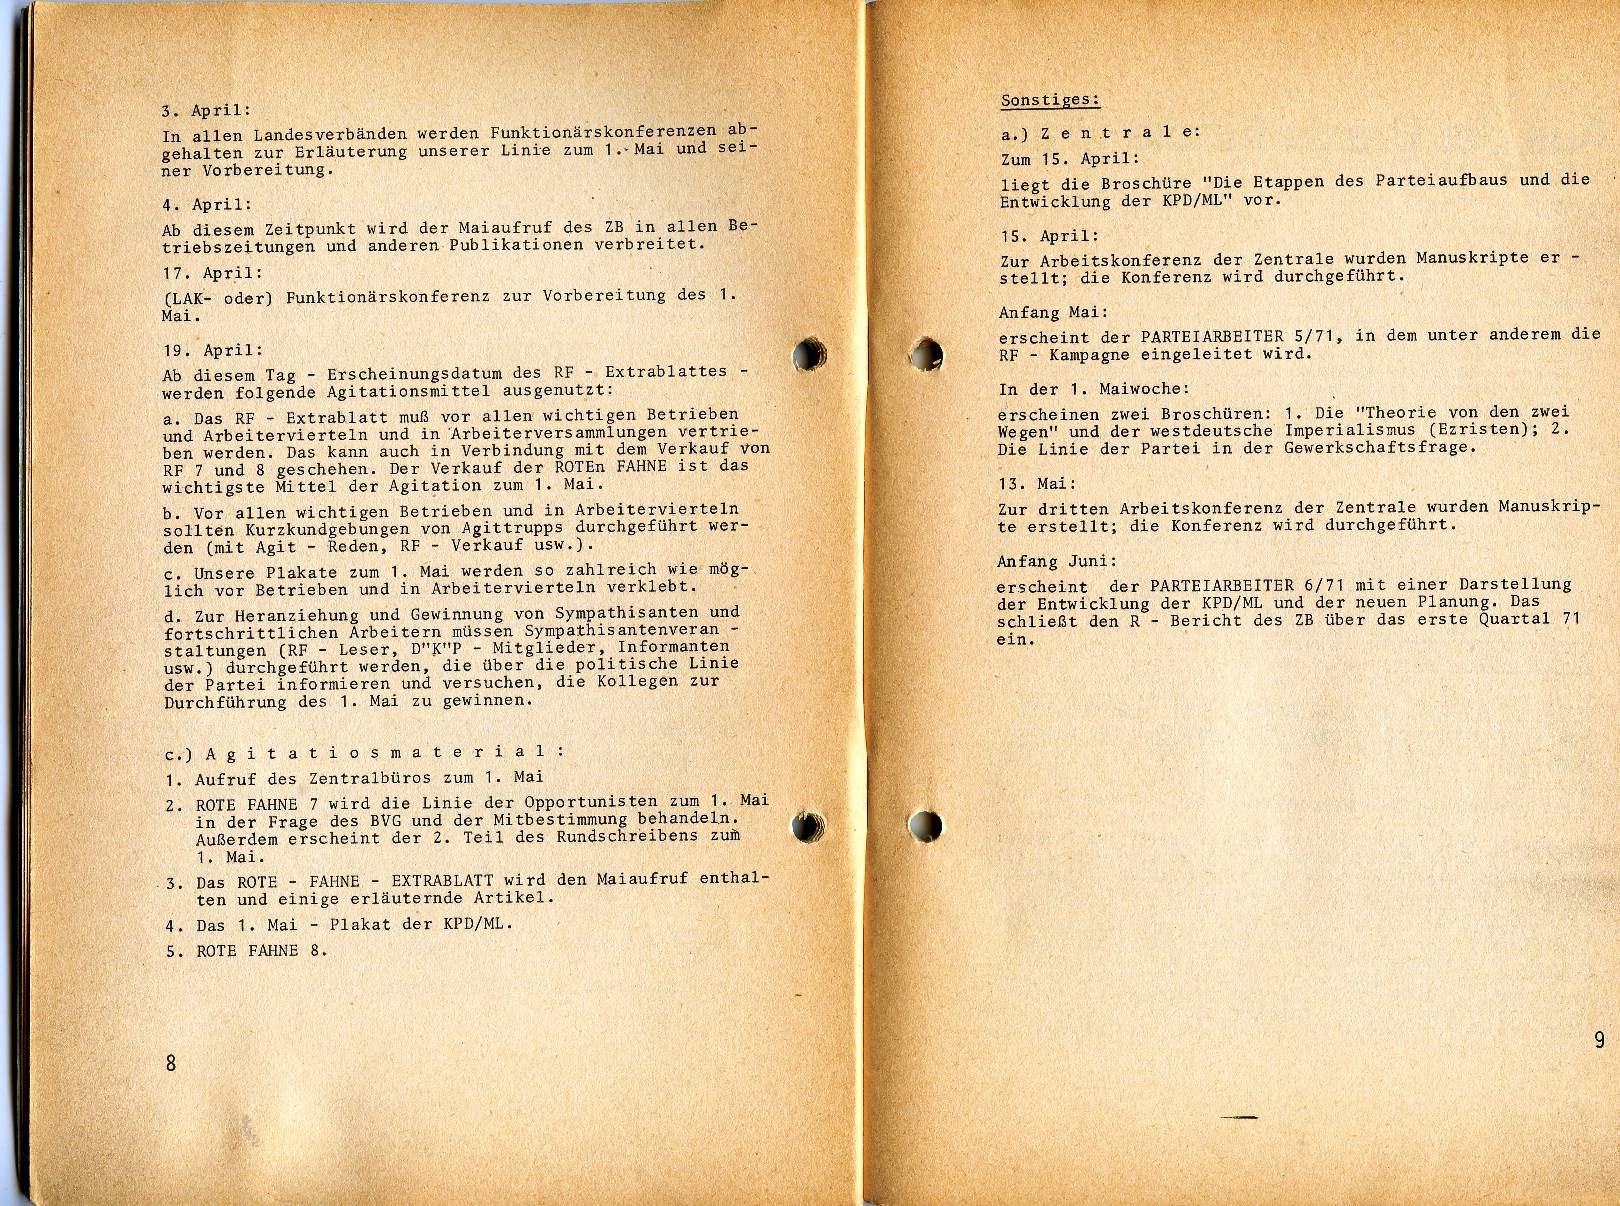 ZB_Parteiarbeiter_1971_04_05